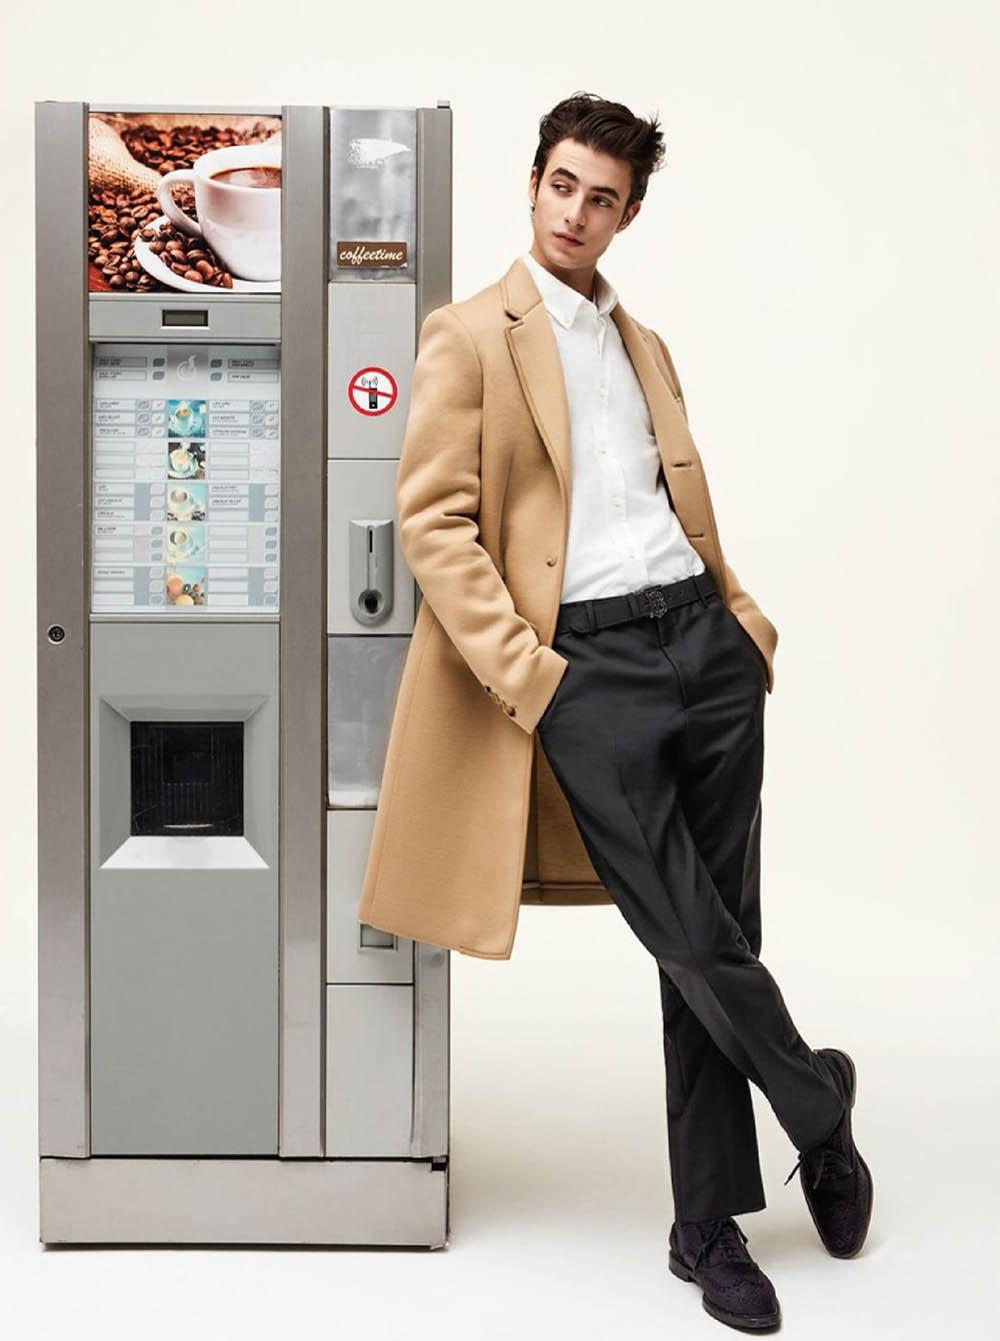 Oscar Kindelan by Kim Reenberg for GQ France May 2019